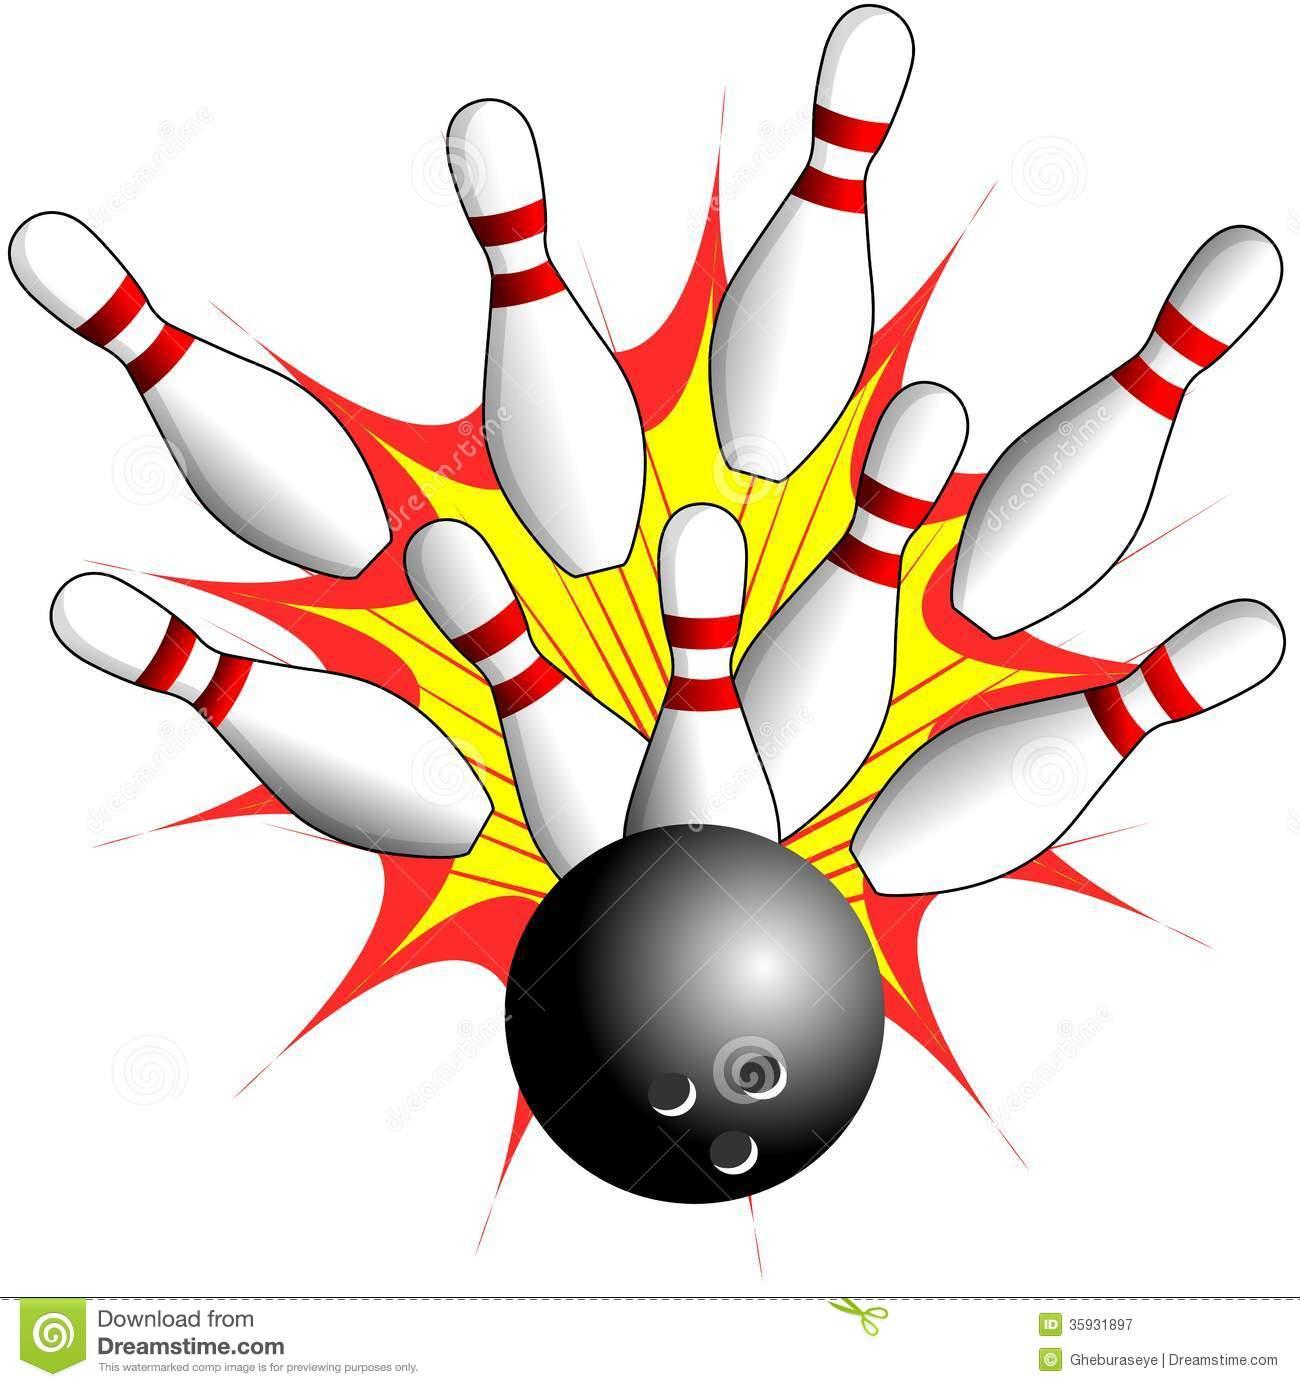 Bowling Alley Clip Art-bowling alley clip art-1